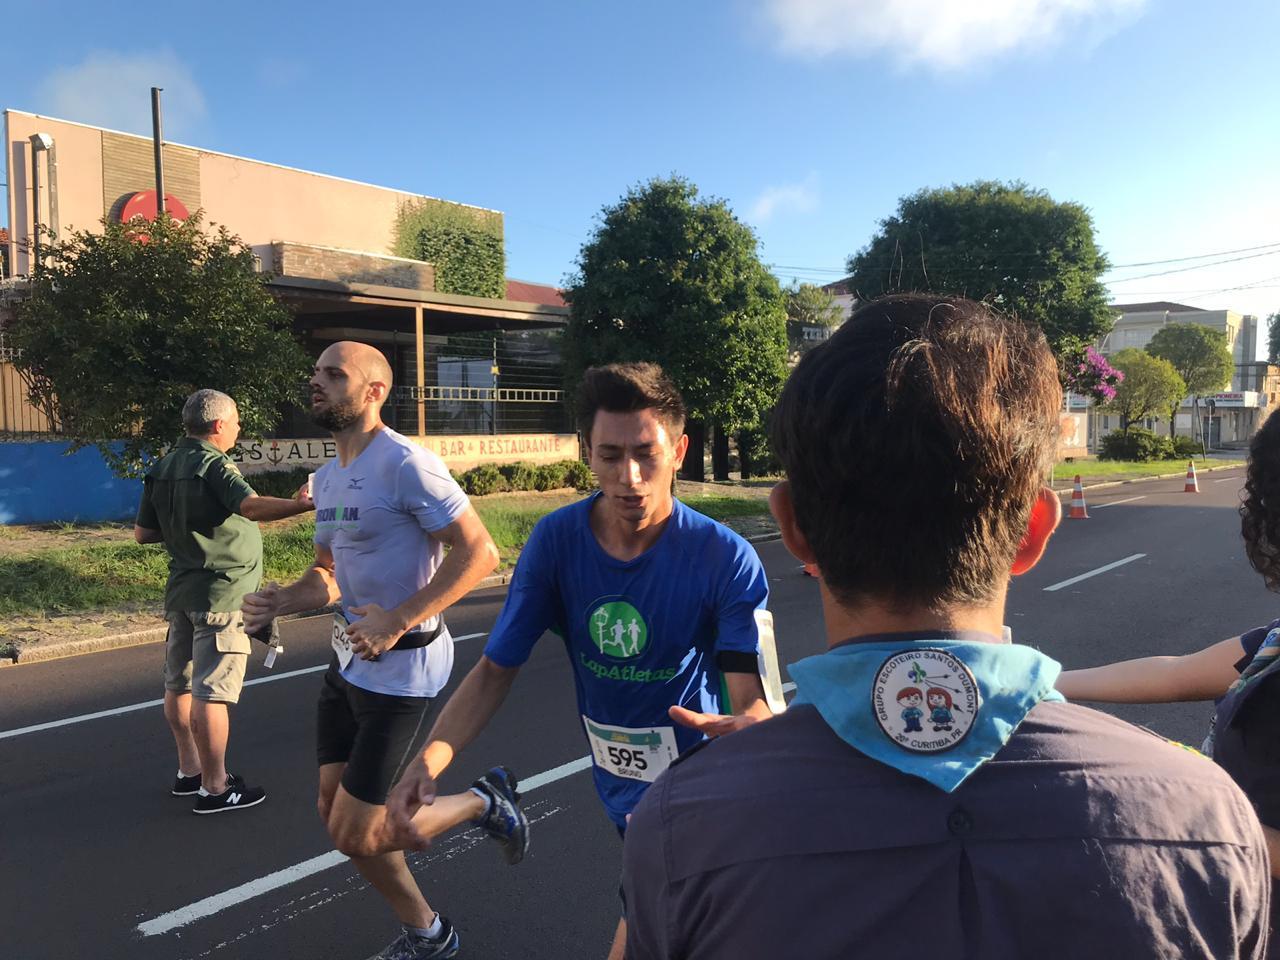 GESD participa, pela segunda vez, da Meia Maratona de Curitiba 2020